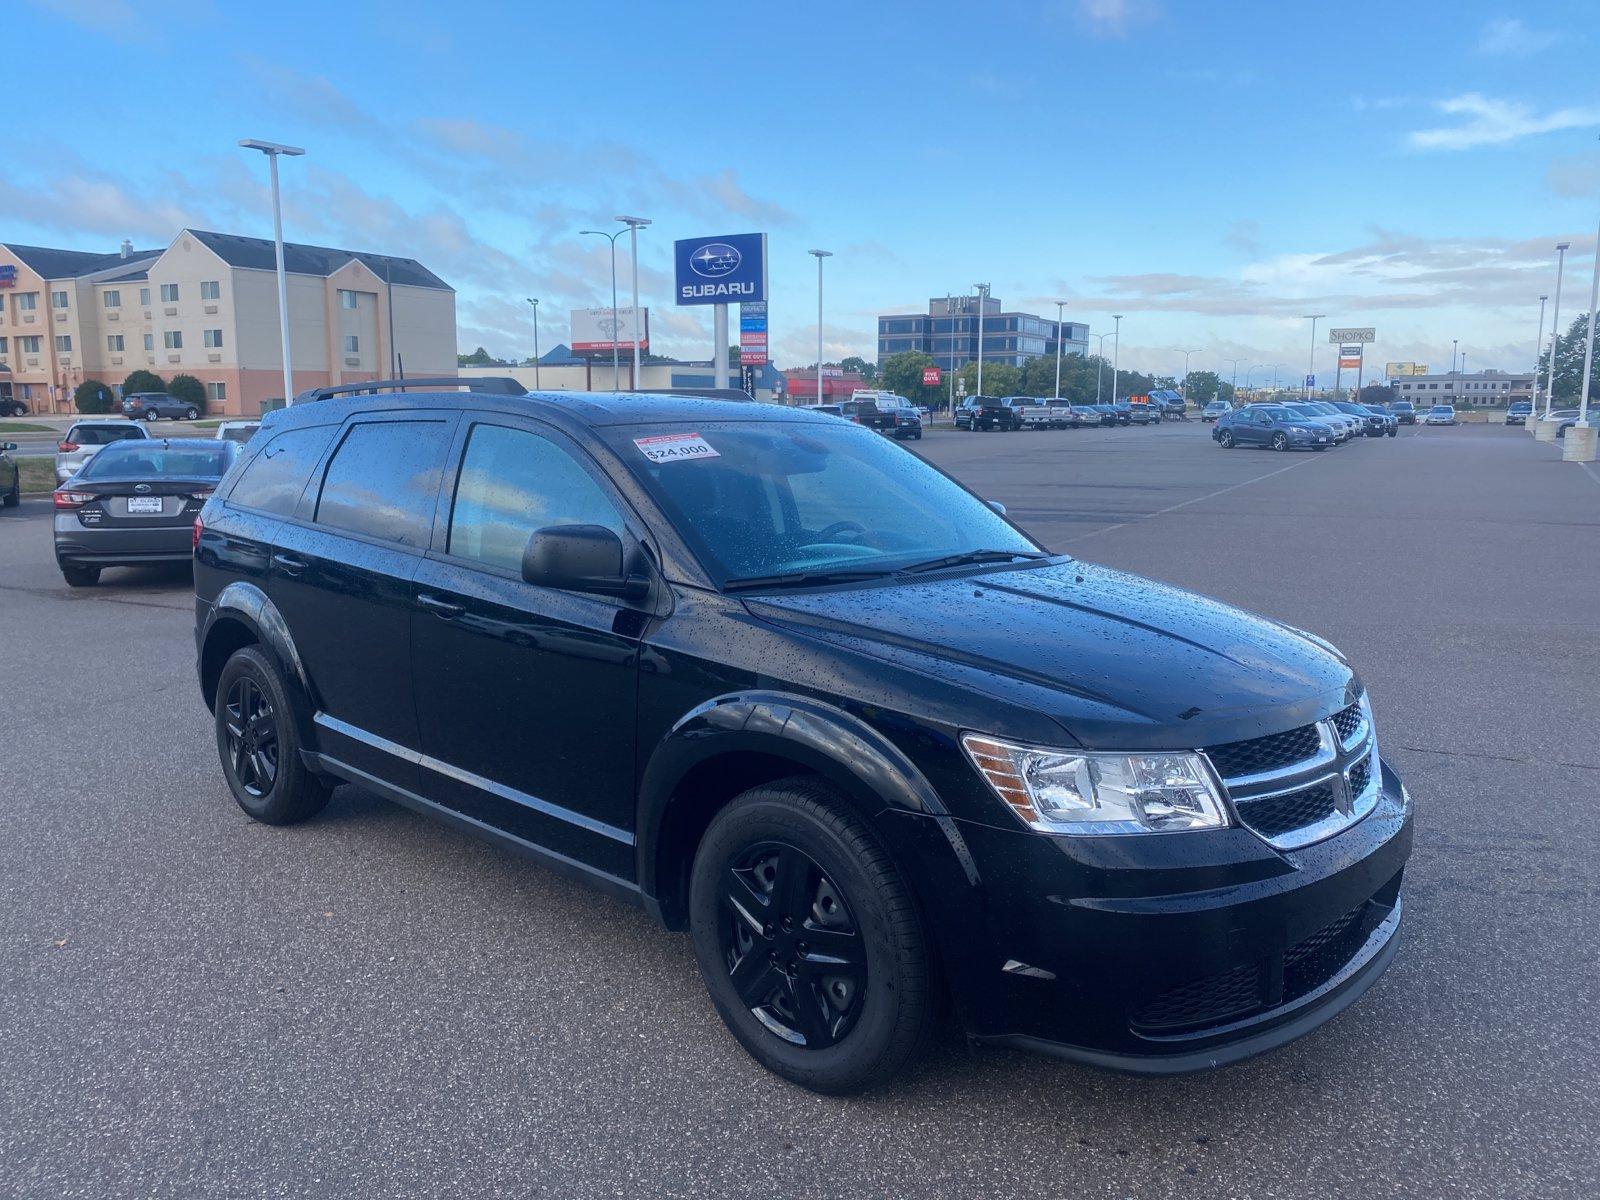 Used 2019 Dodge Journey SE with VIN 3C4PDCAB5KT872183 for sale in Saint Cloud, Minnesota